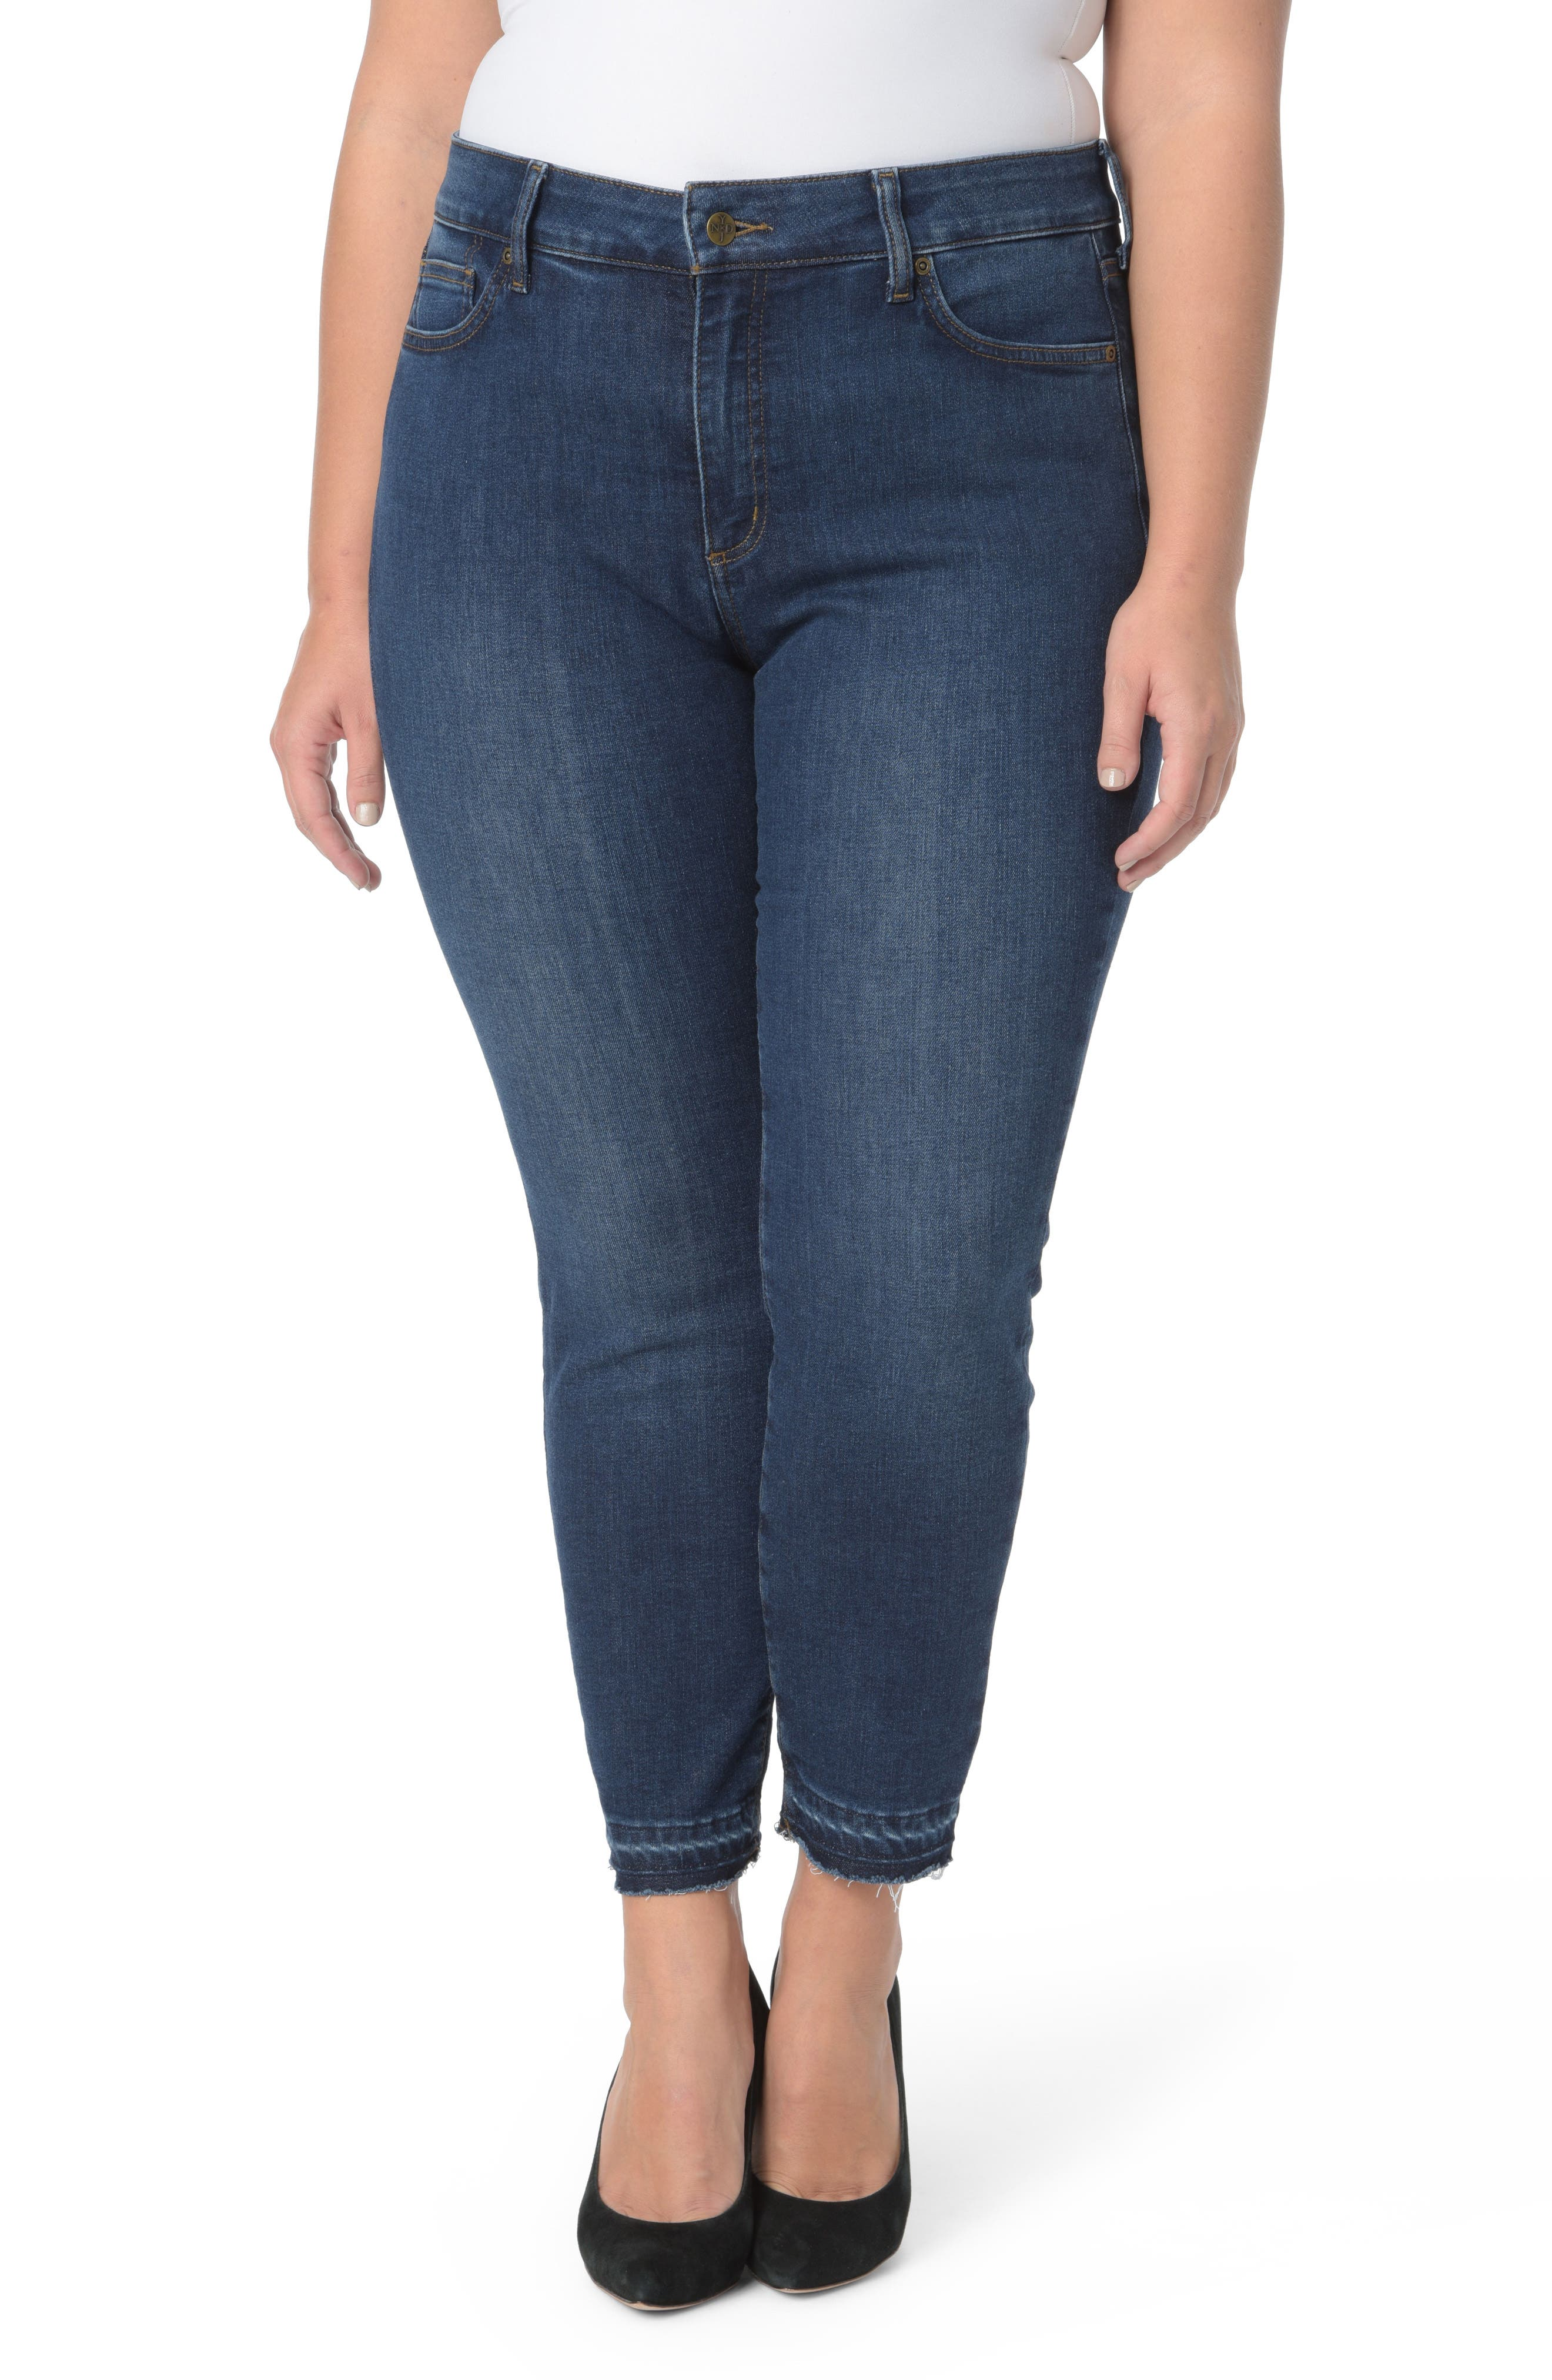 Alternate Image 1 Selected - NYDJ Alina Release Hem Ankle Jeans (Cooper) (Plus Size)